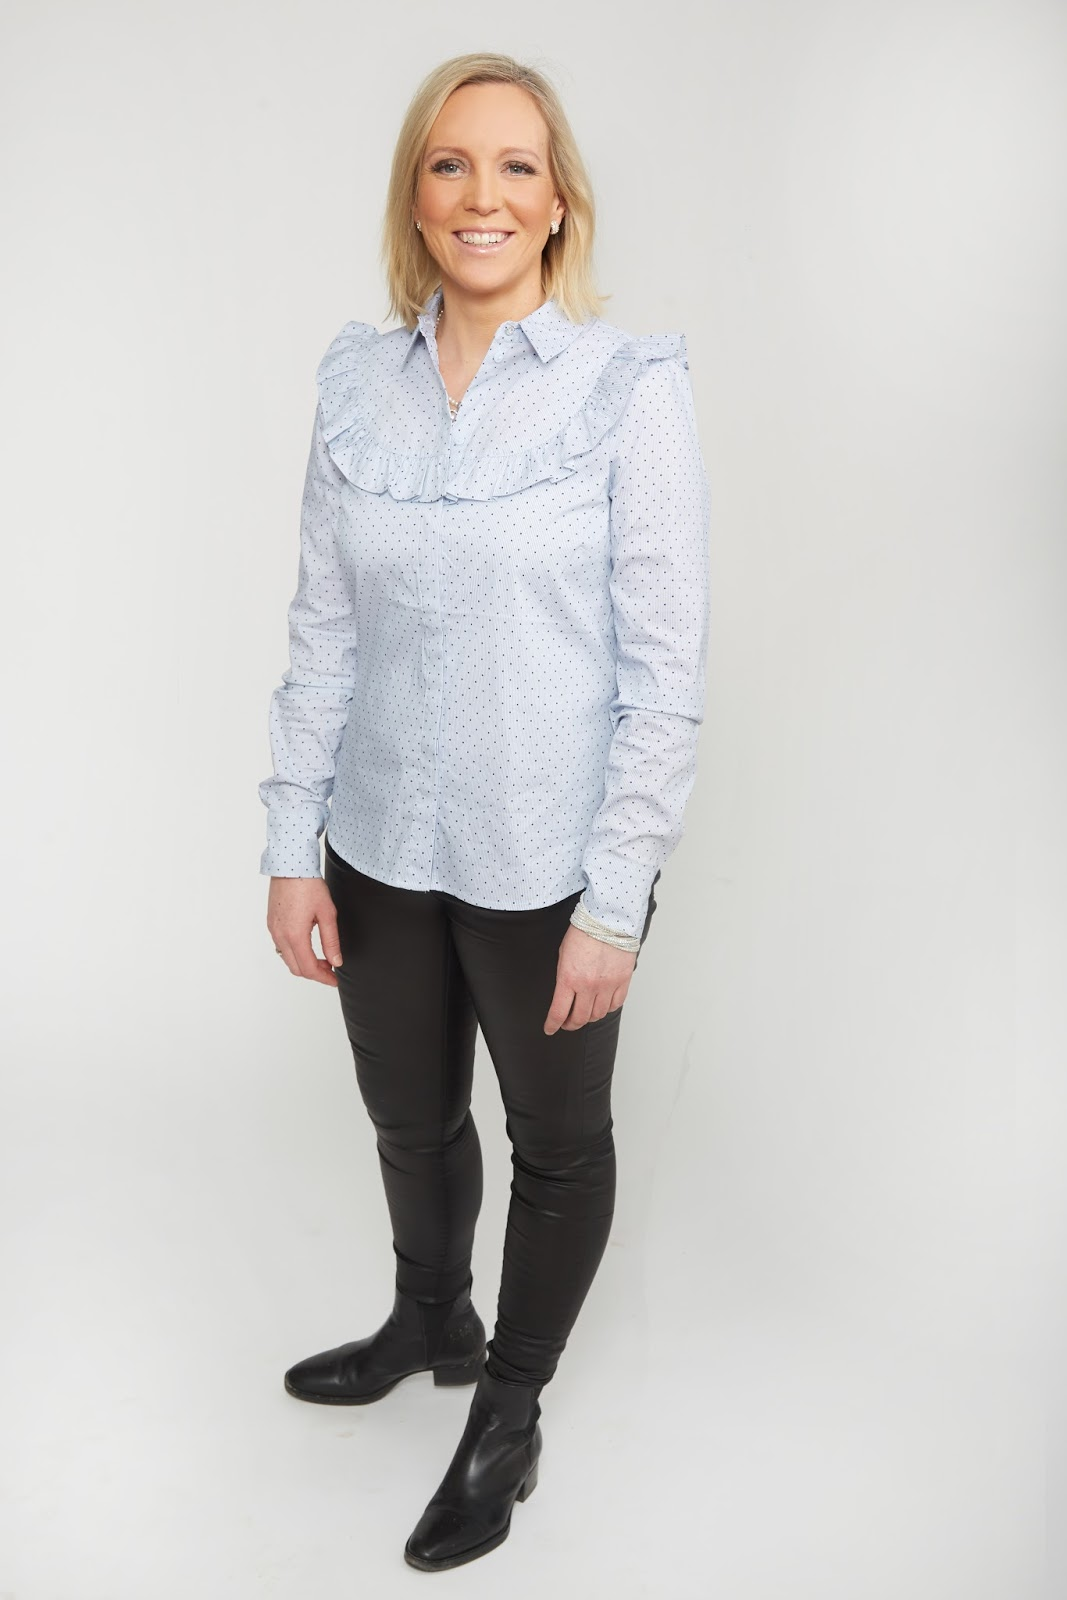 Laura Vanamo